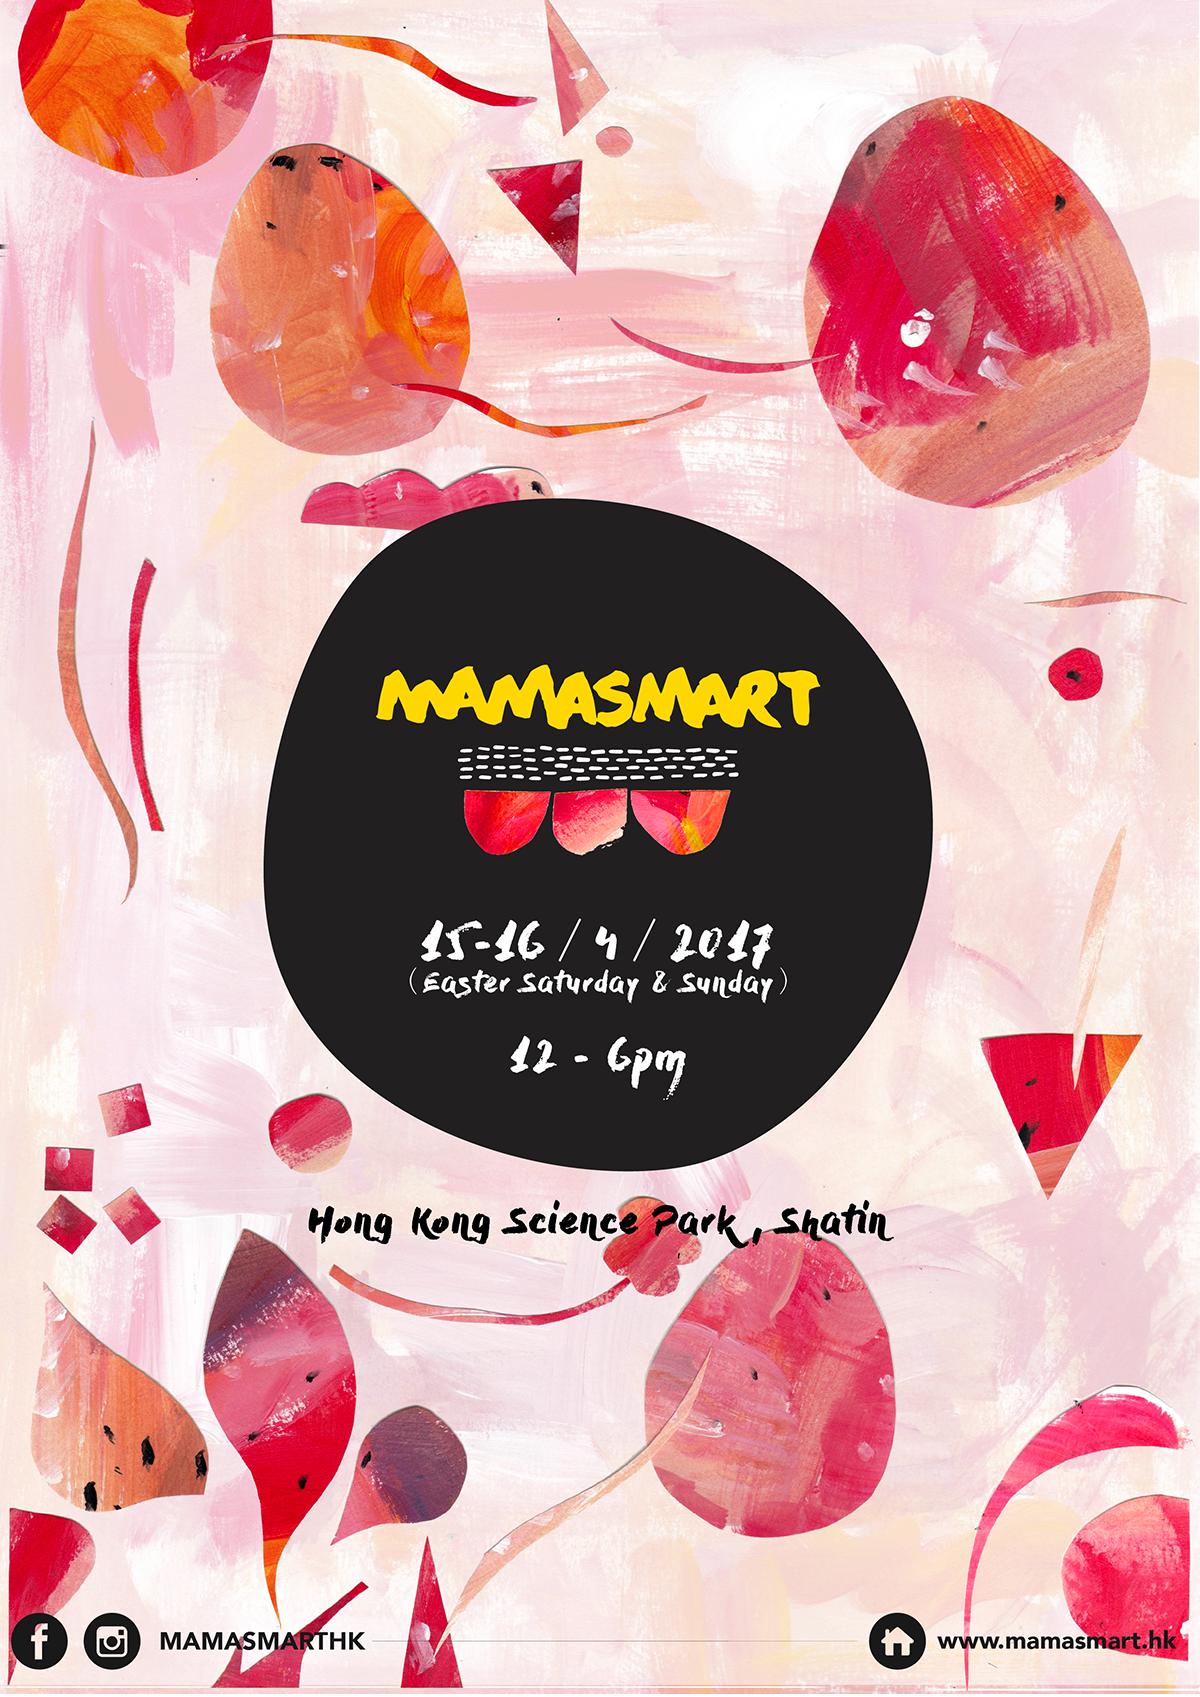 GRAPHICS DESIGN FOR MAMASMART - 2017